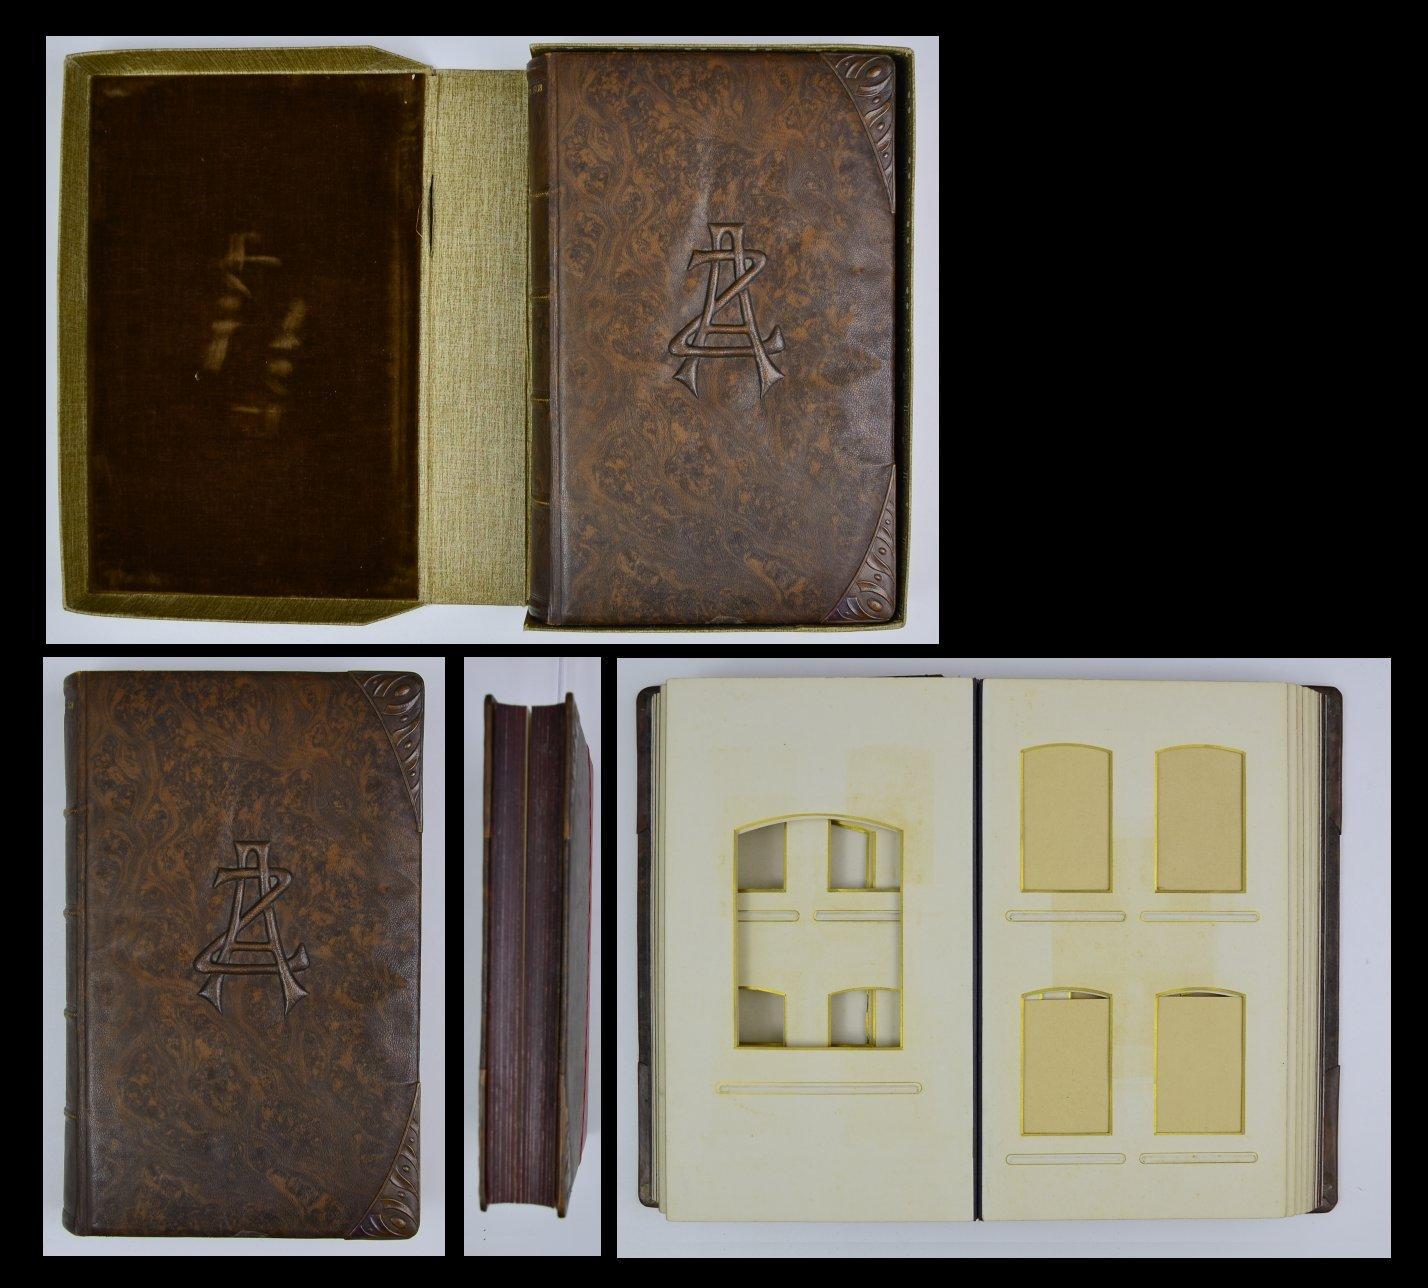 Fotoalbum 1908 Jugendstil Initialen AZ, Bronzebeschläge Ecken,